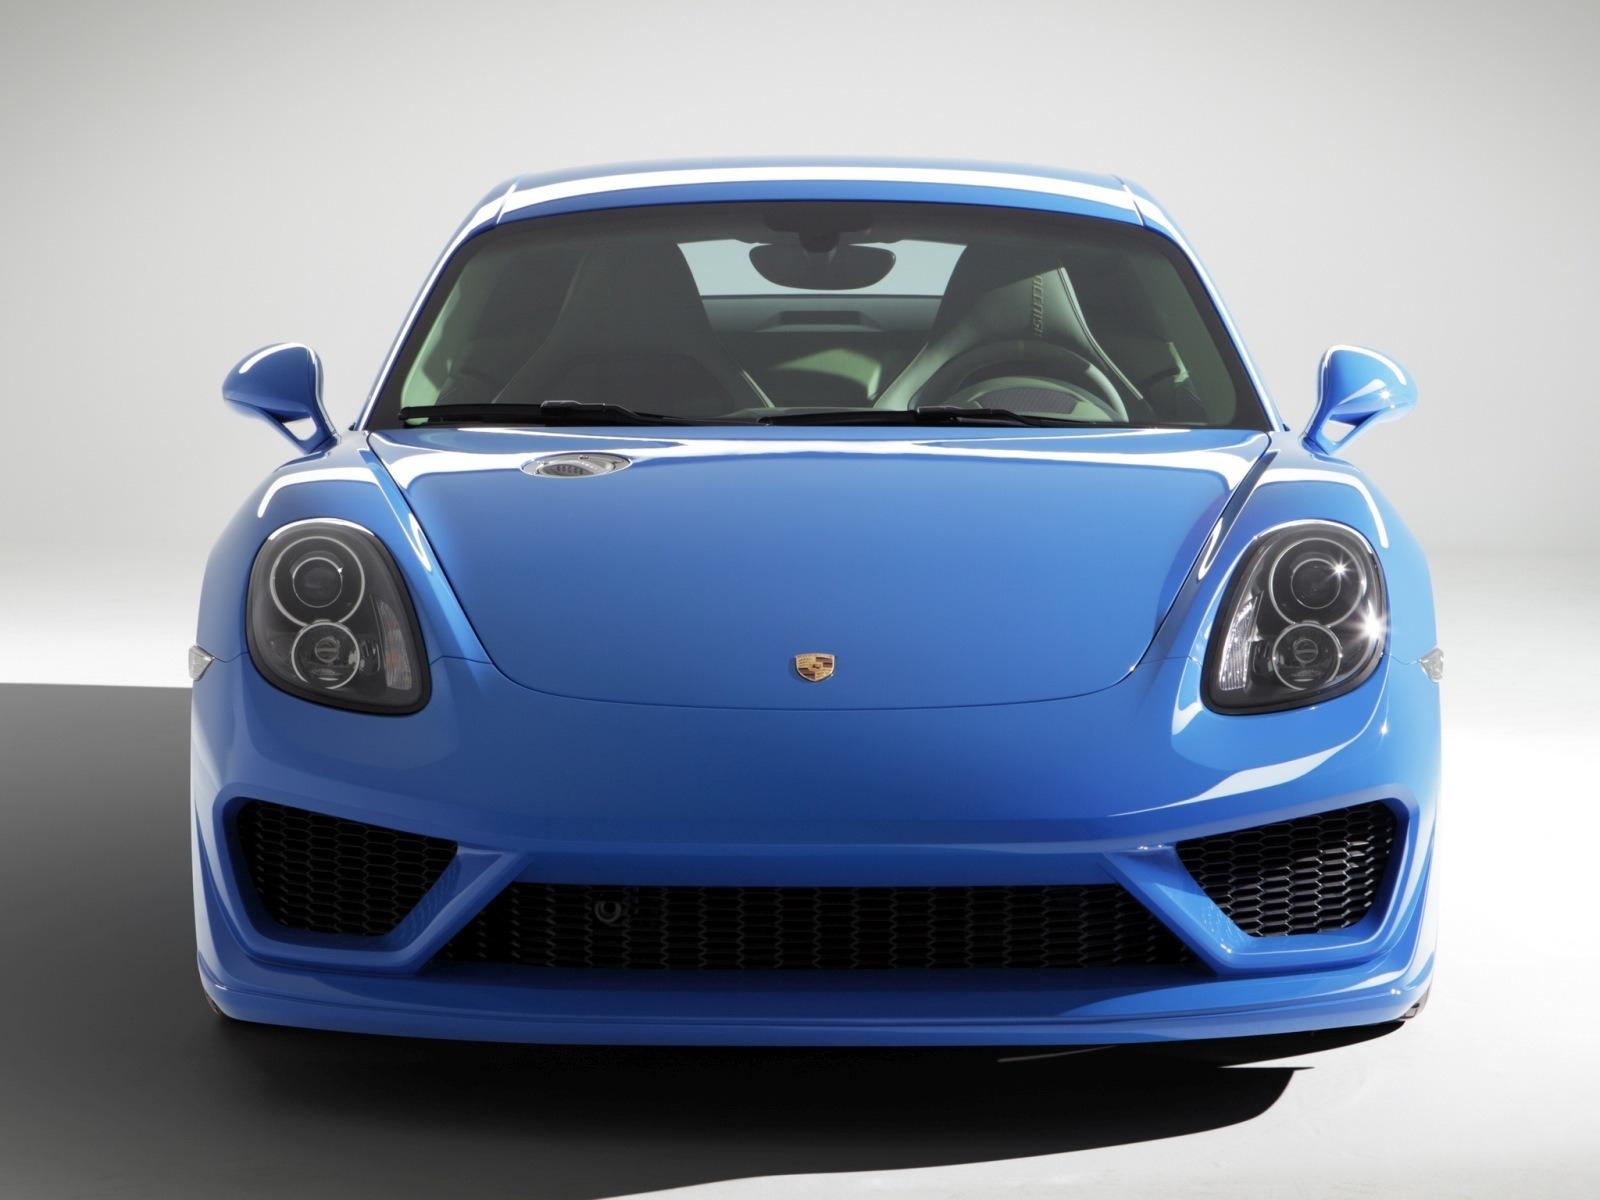 http://images.caradisiac.com/images/3/2/8/9/93289/S0-Studiotorino-Moncenisio-une-Porsche-Cayman-exclusive-317294.jpg